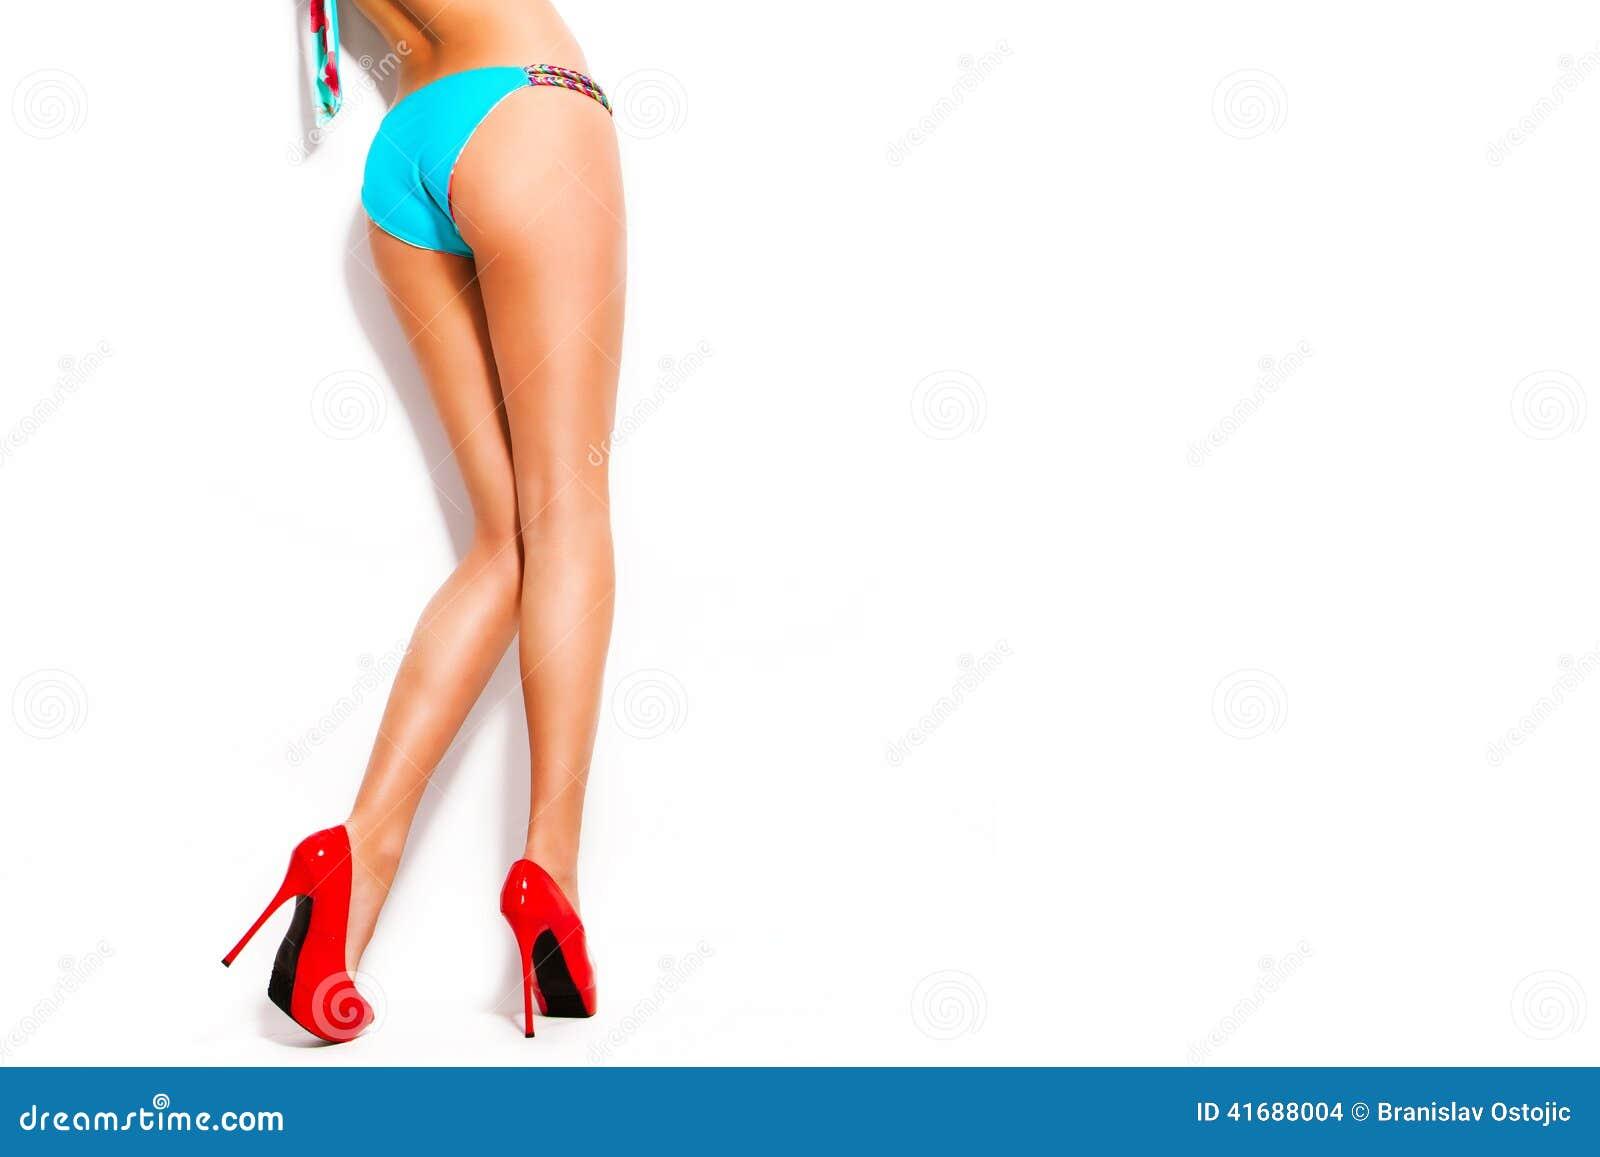 Szpilki bikini i buty